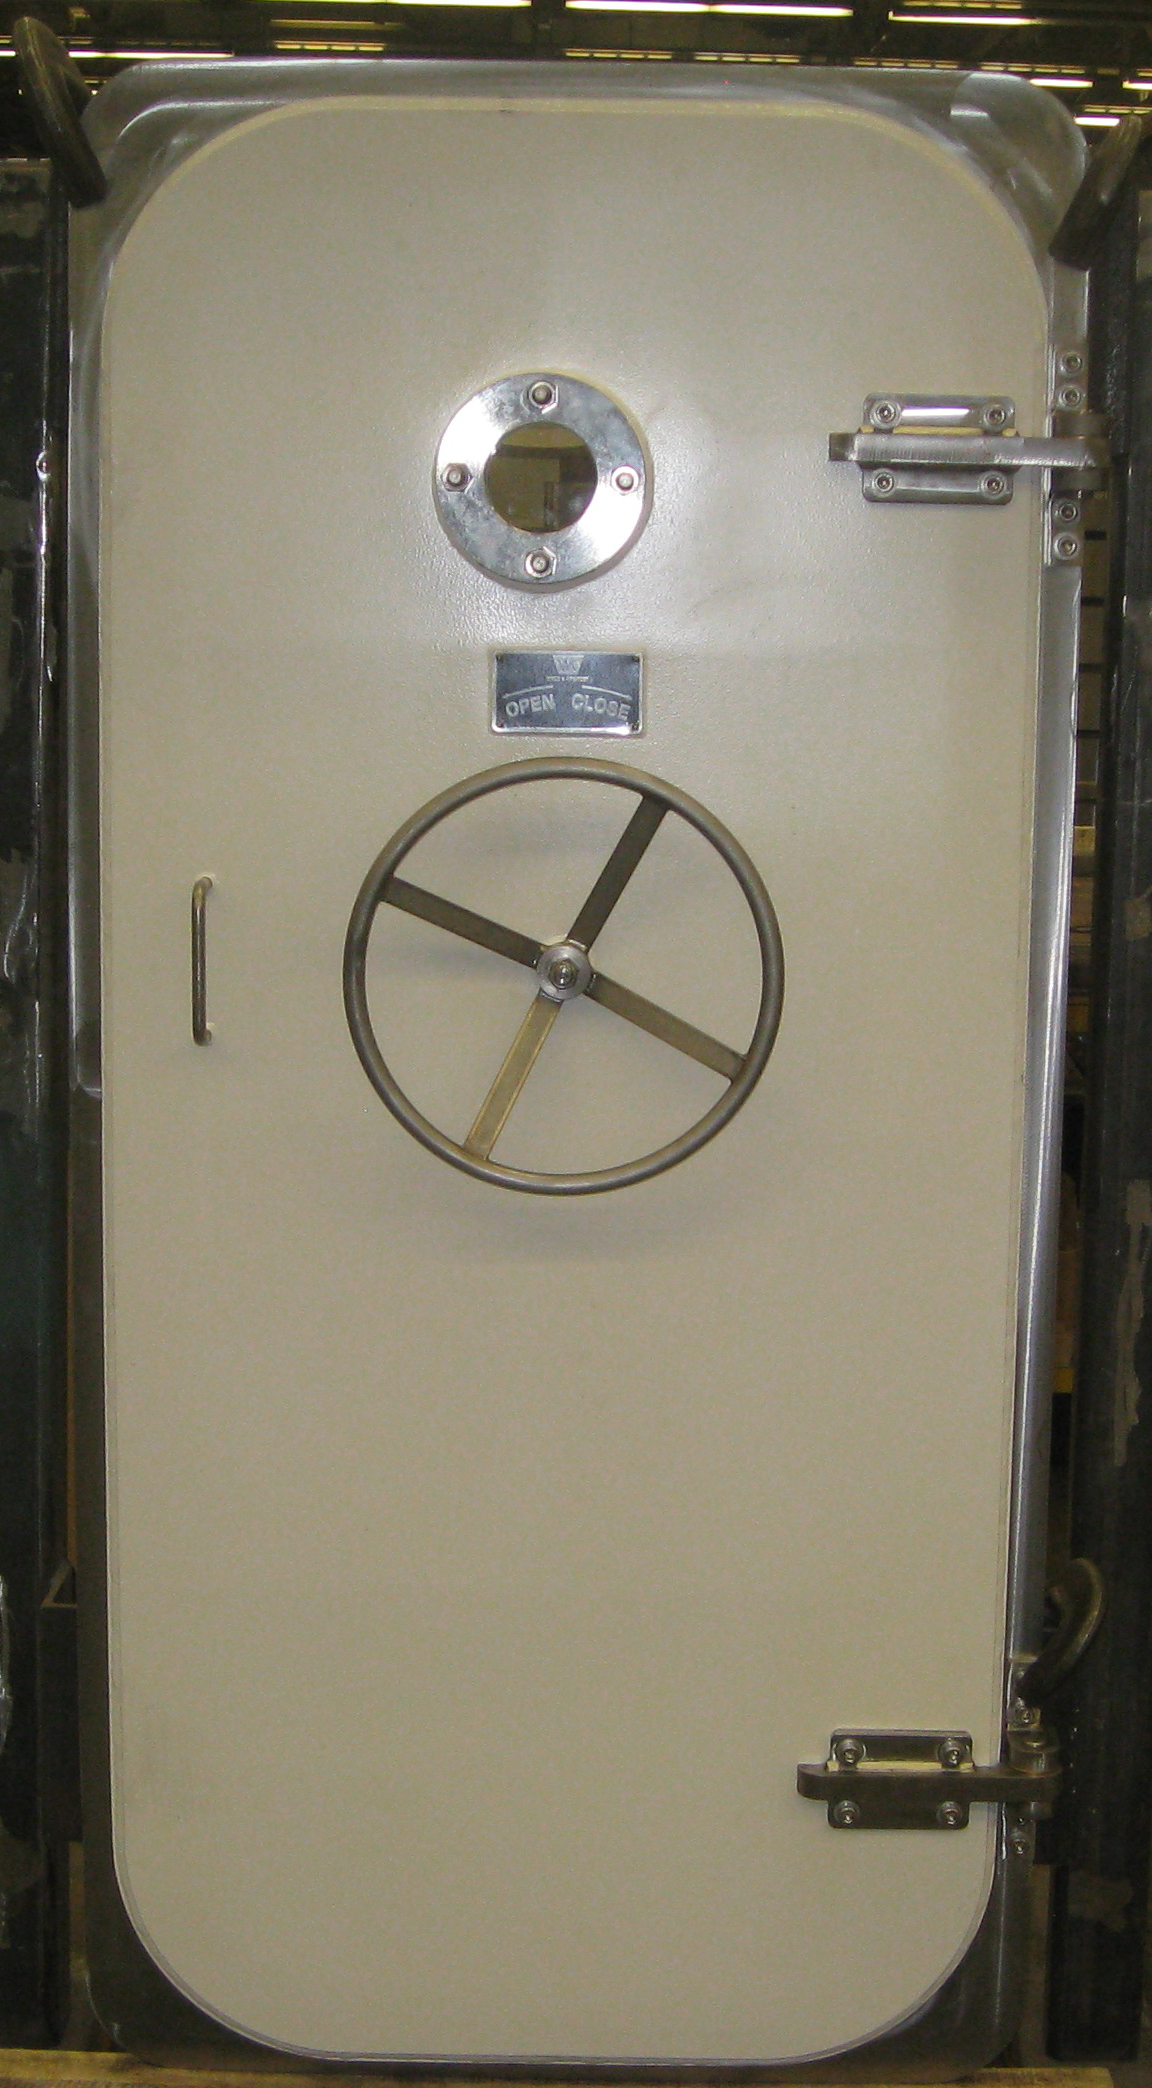 Mvc-015s U1 wtight p1 cropped & Airlocks u0026 Special Doors | Walz u0026 Krenzer Inc